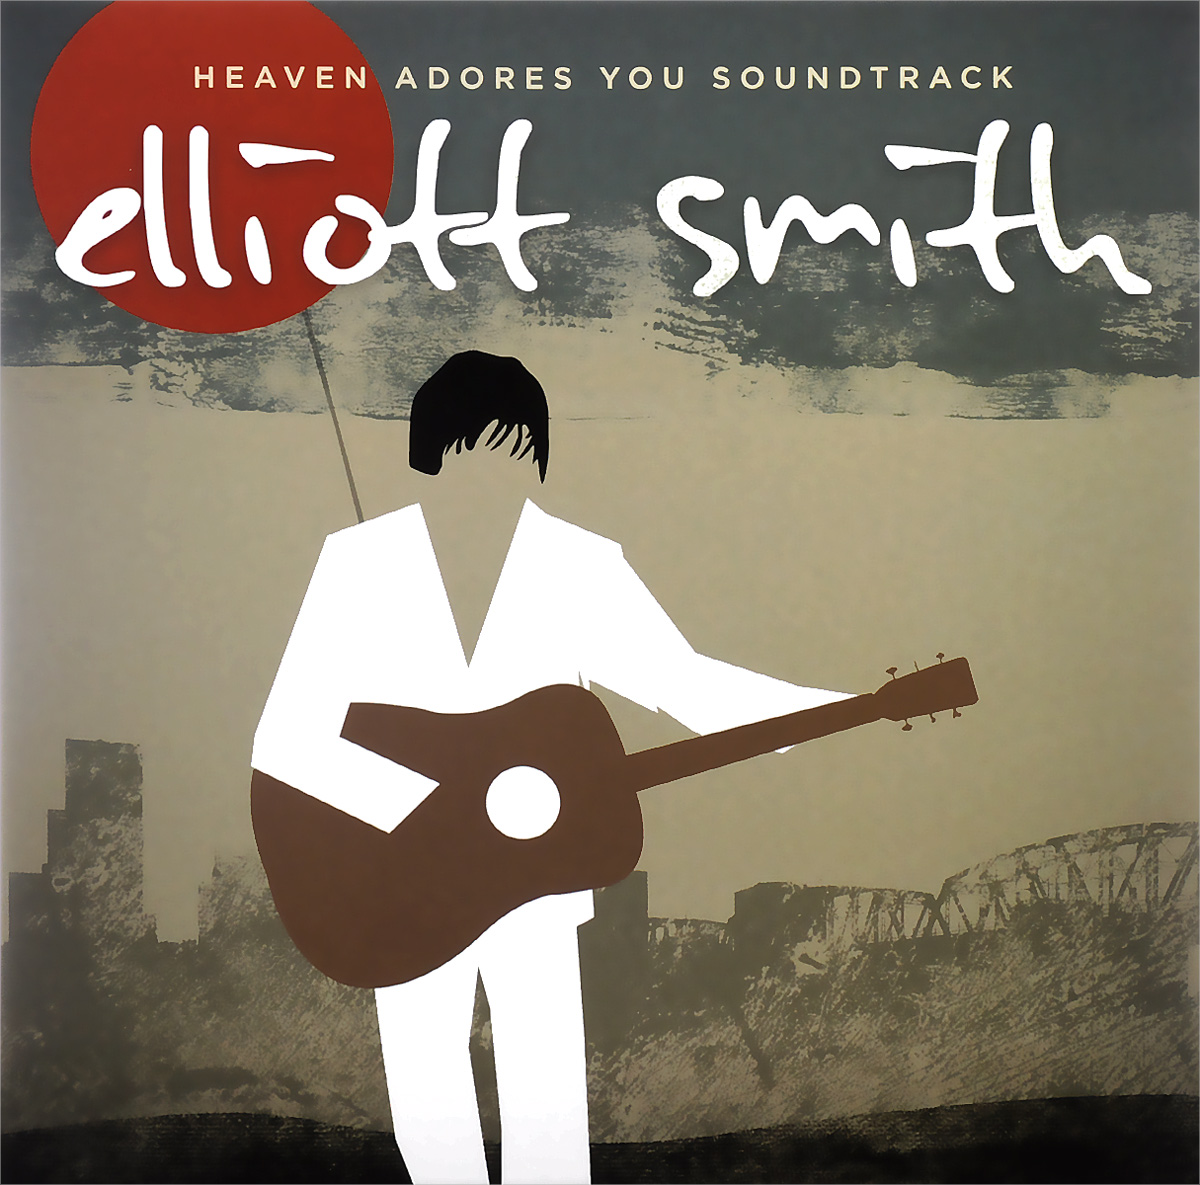 Эллиот Смит,Heatmiser,Neil Gust,Conan O'Brien Elliott Smith. Heaven Adores You. Soundtrack (2 LP) elliot attipoe securing the public wireless network